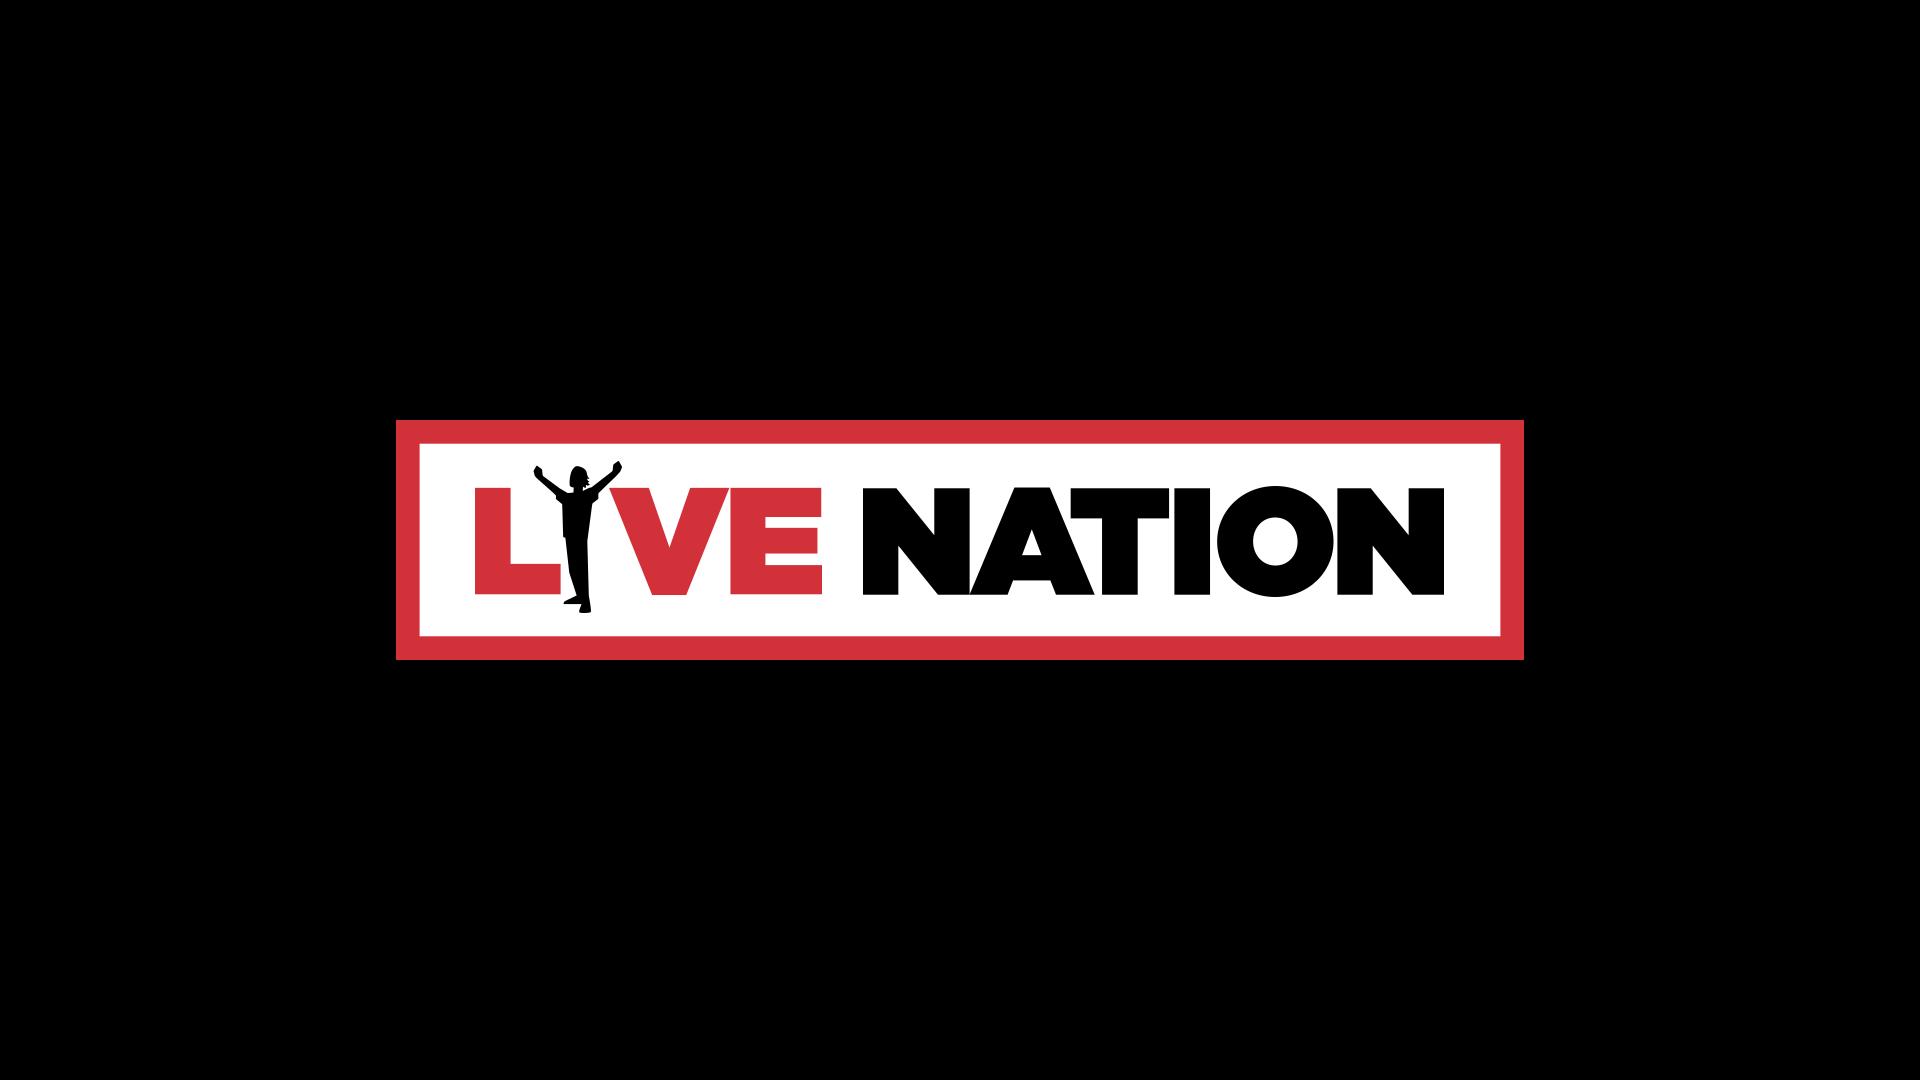 Live Nation Cabana Daily Content_ver1.1.001.jpeg